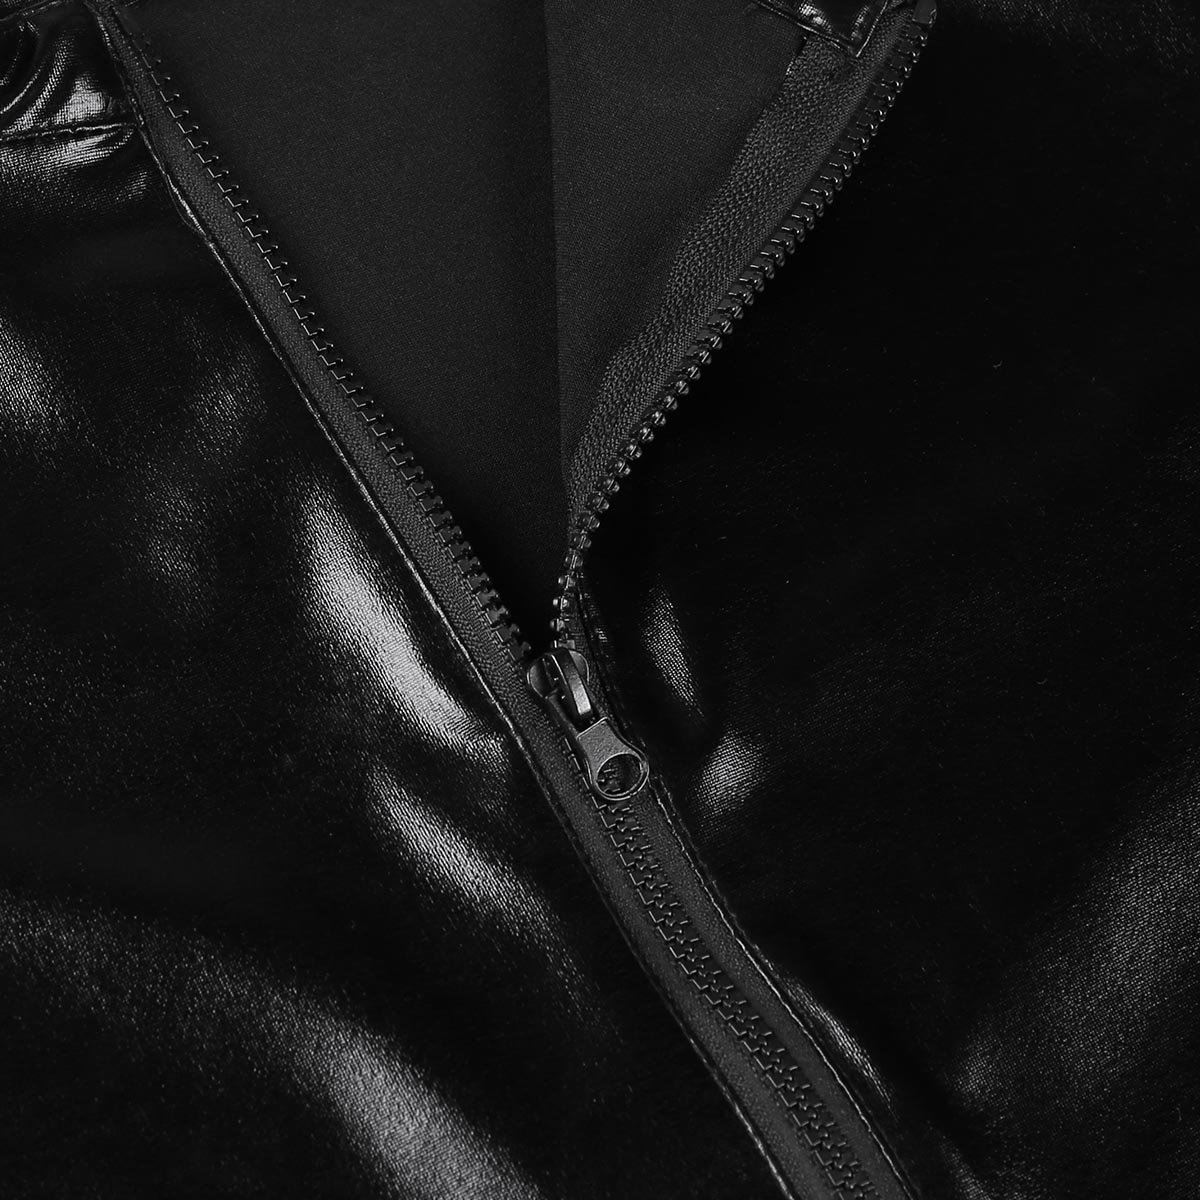 c56da02774 Bekleidung YiZYiF Herren Body Latex Unterwäsche Unterhemd Overall Männer  Wetlook Bodysuit Jumpsuit Lange Hose Pants Schwarz Herren